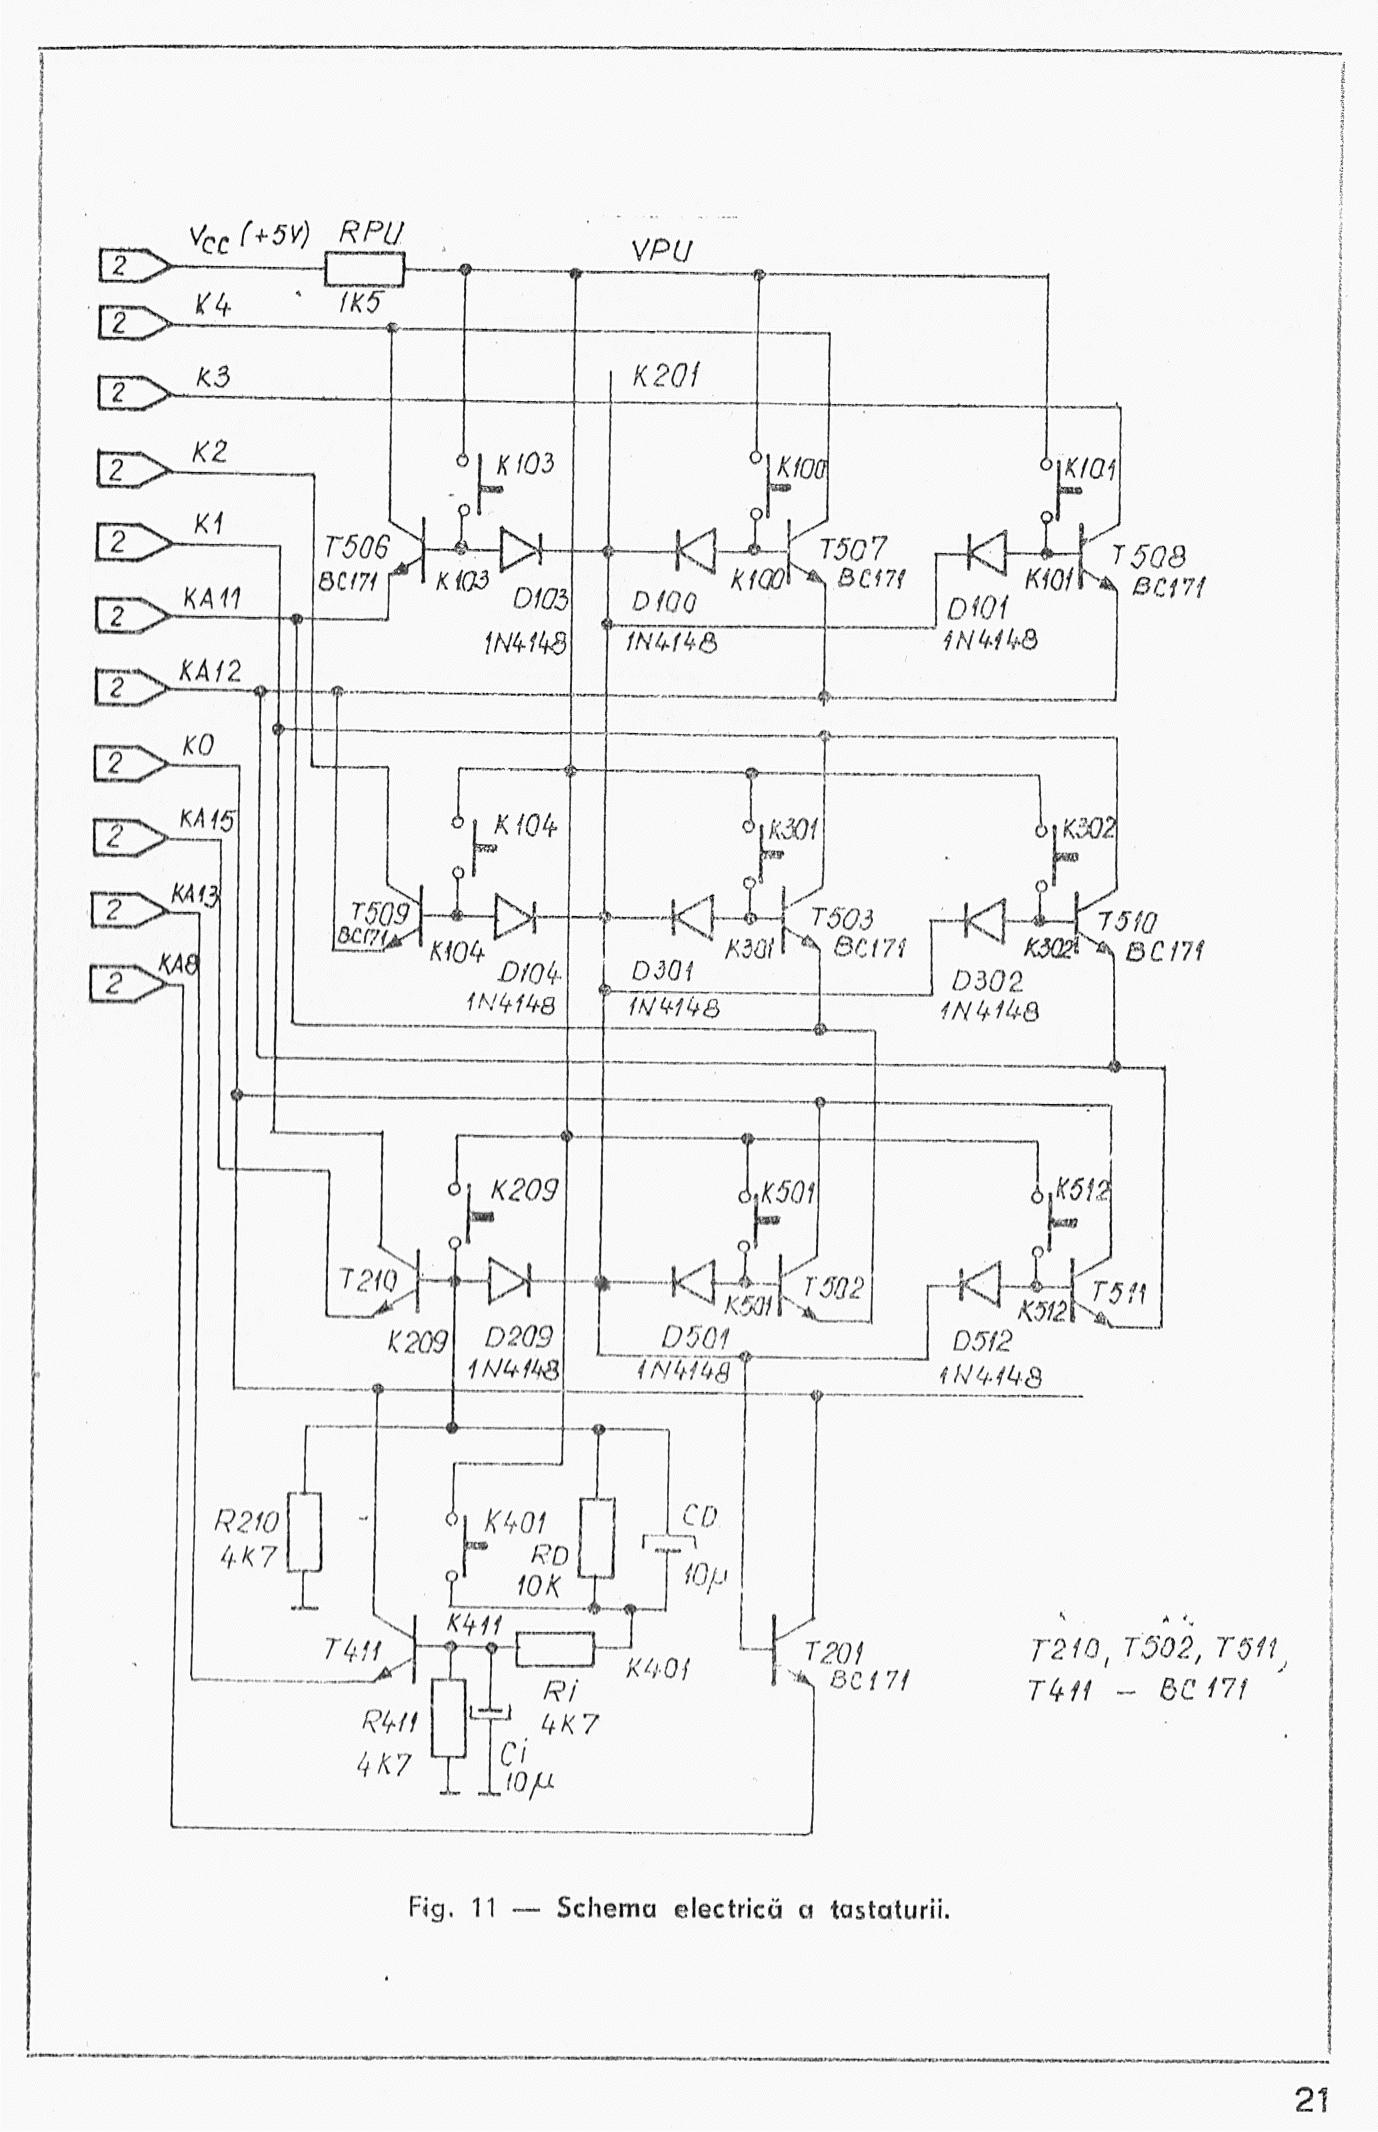 The Original Cp M Cobra Manual 7400 Quad 2input Nand Gate Pin Layout Pag21